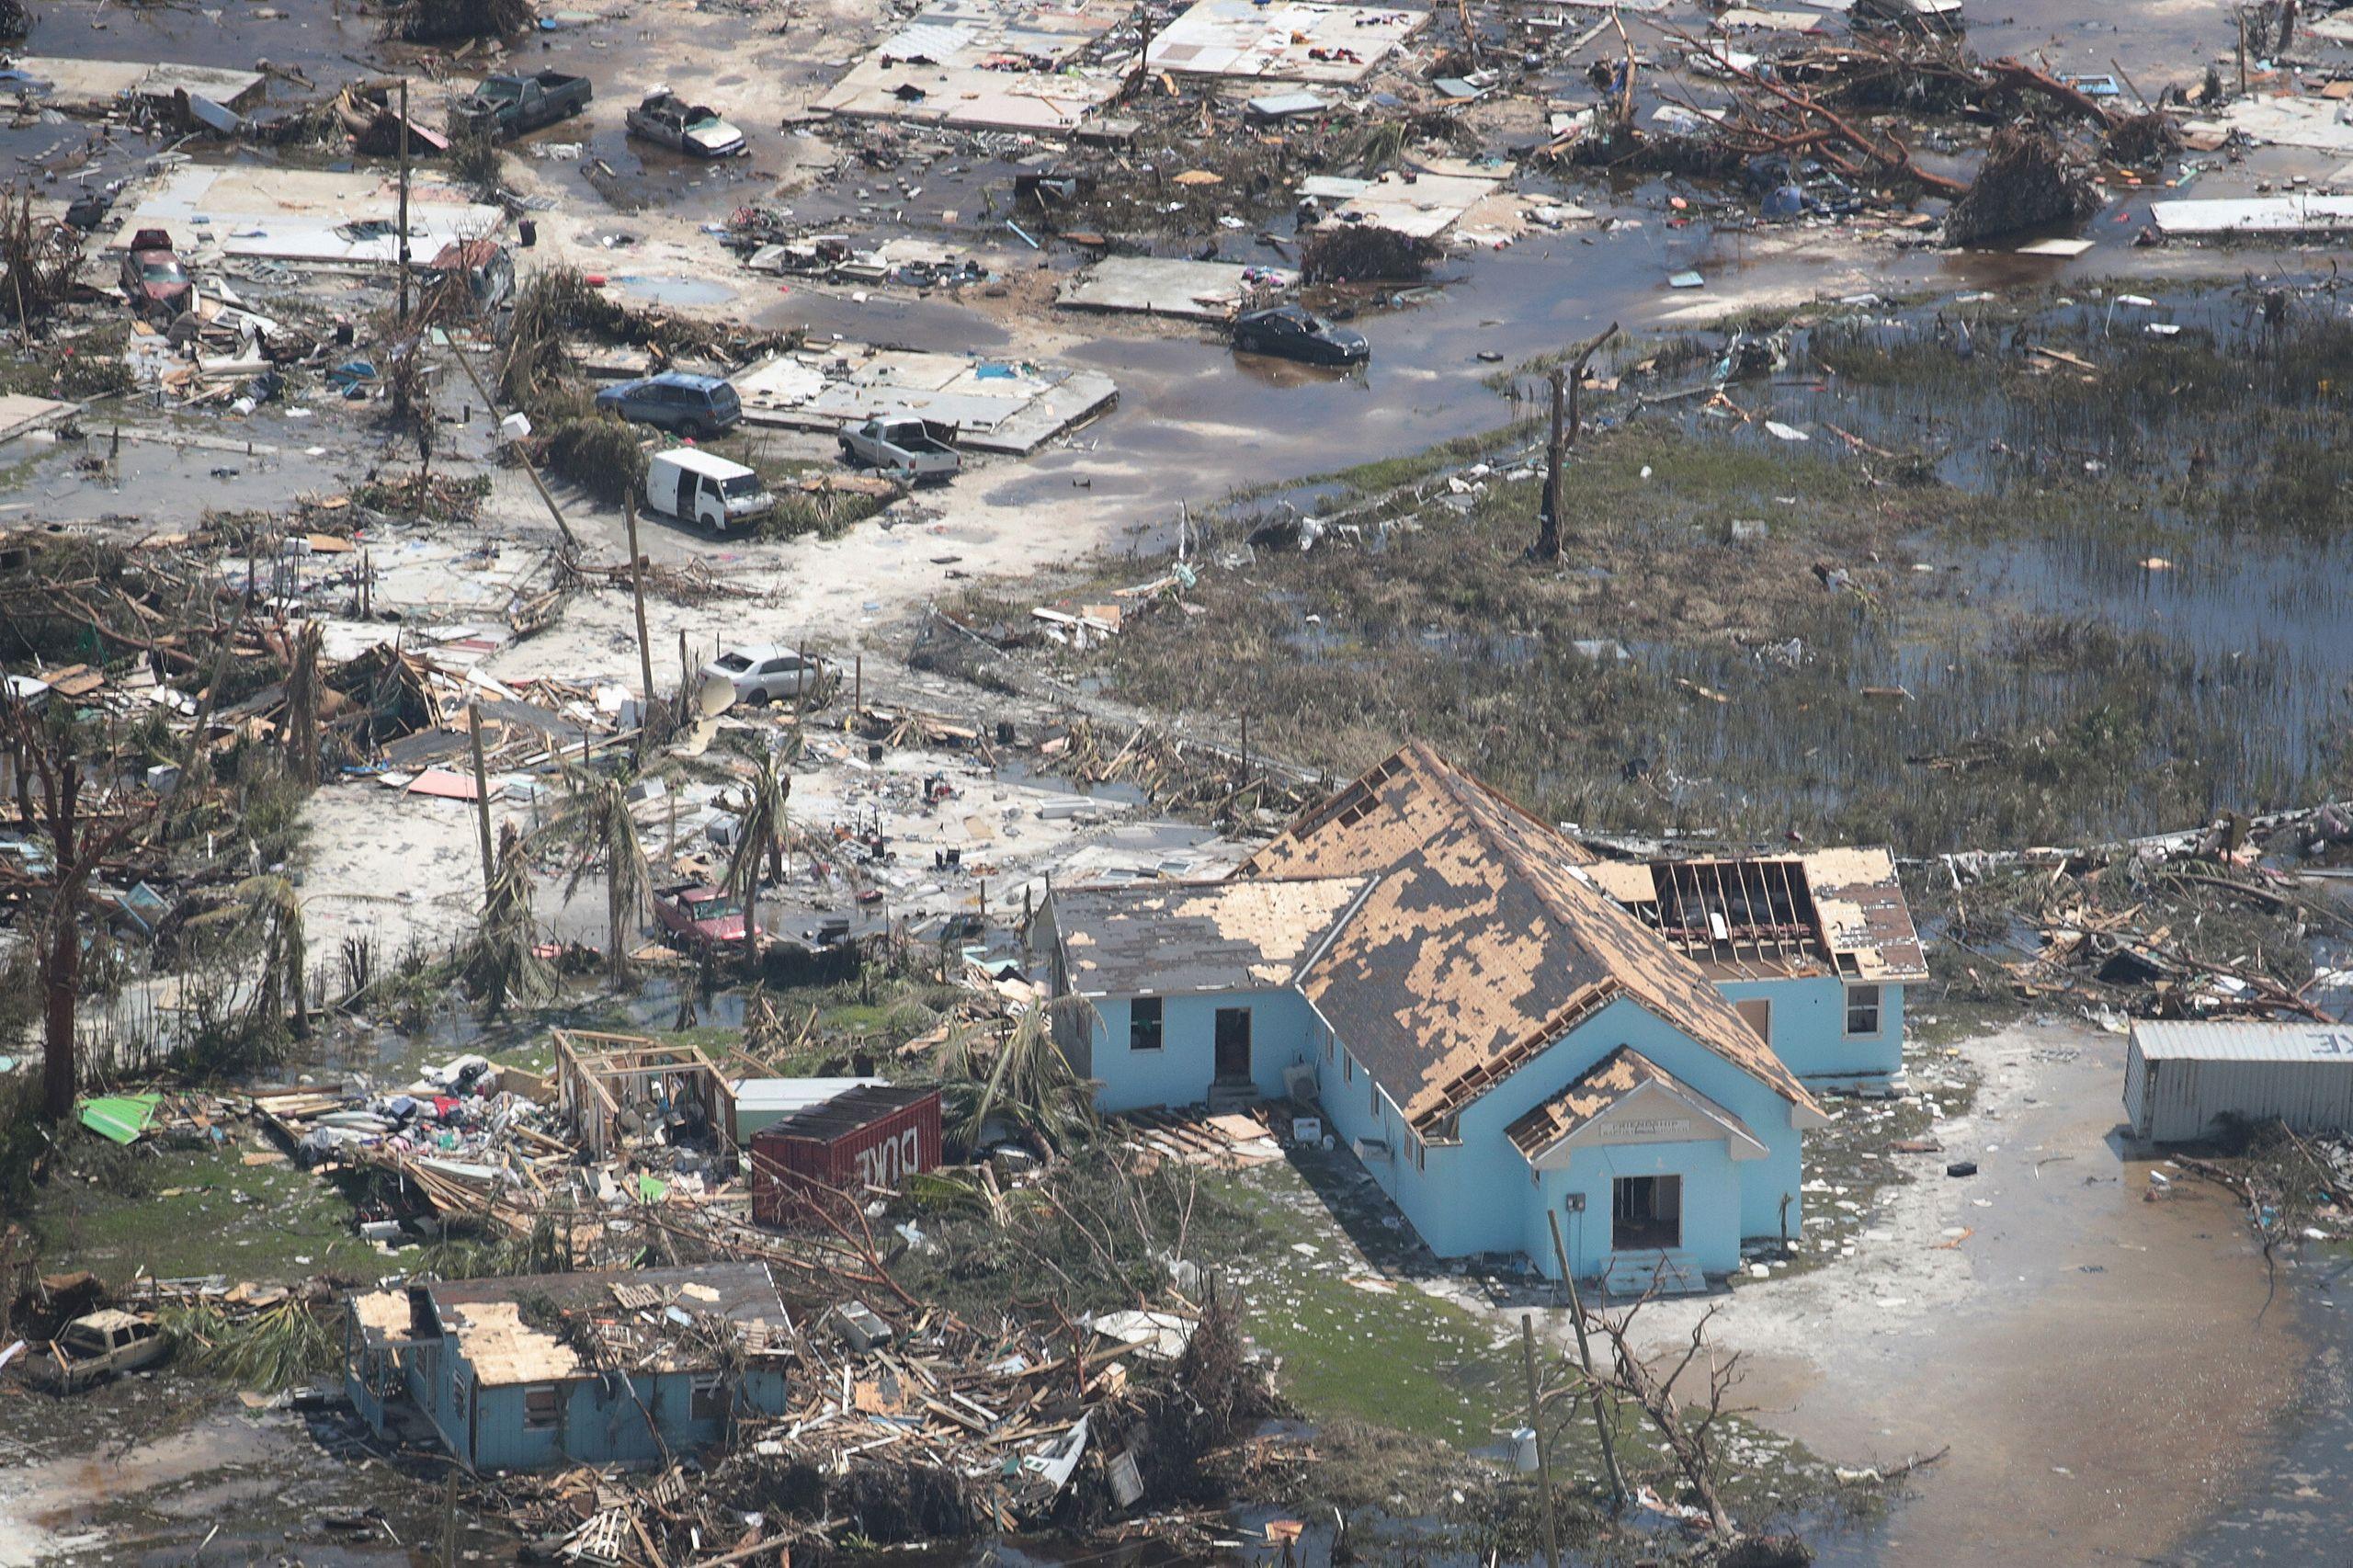 Westlake Legal Group 5d715fa52500004d1205421c Dramatic Images Show Hurricane Dorian Destruction From Above